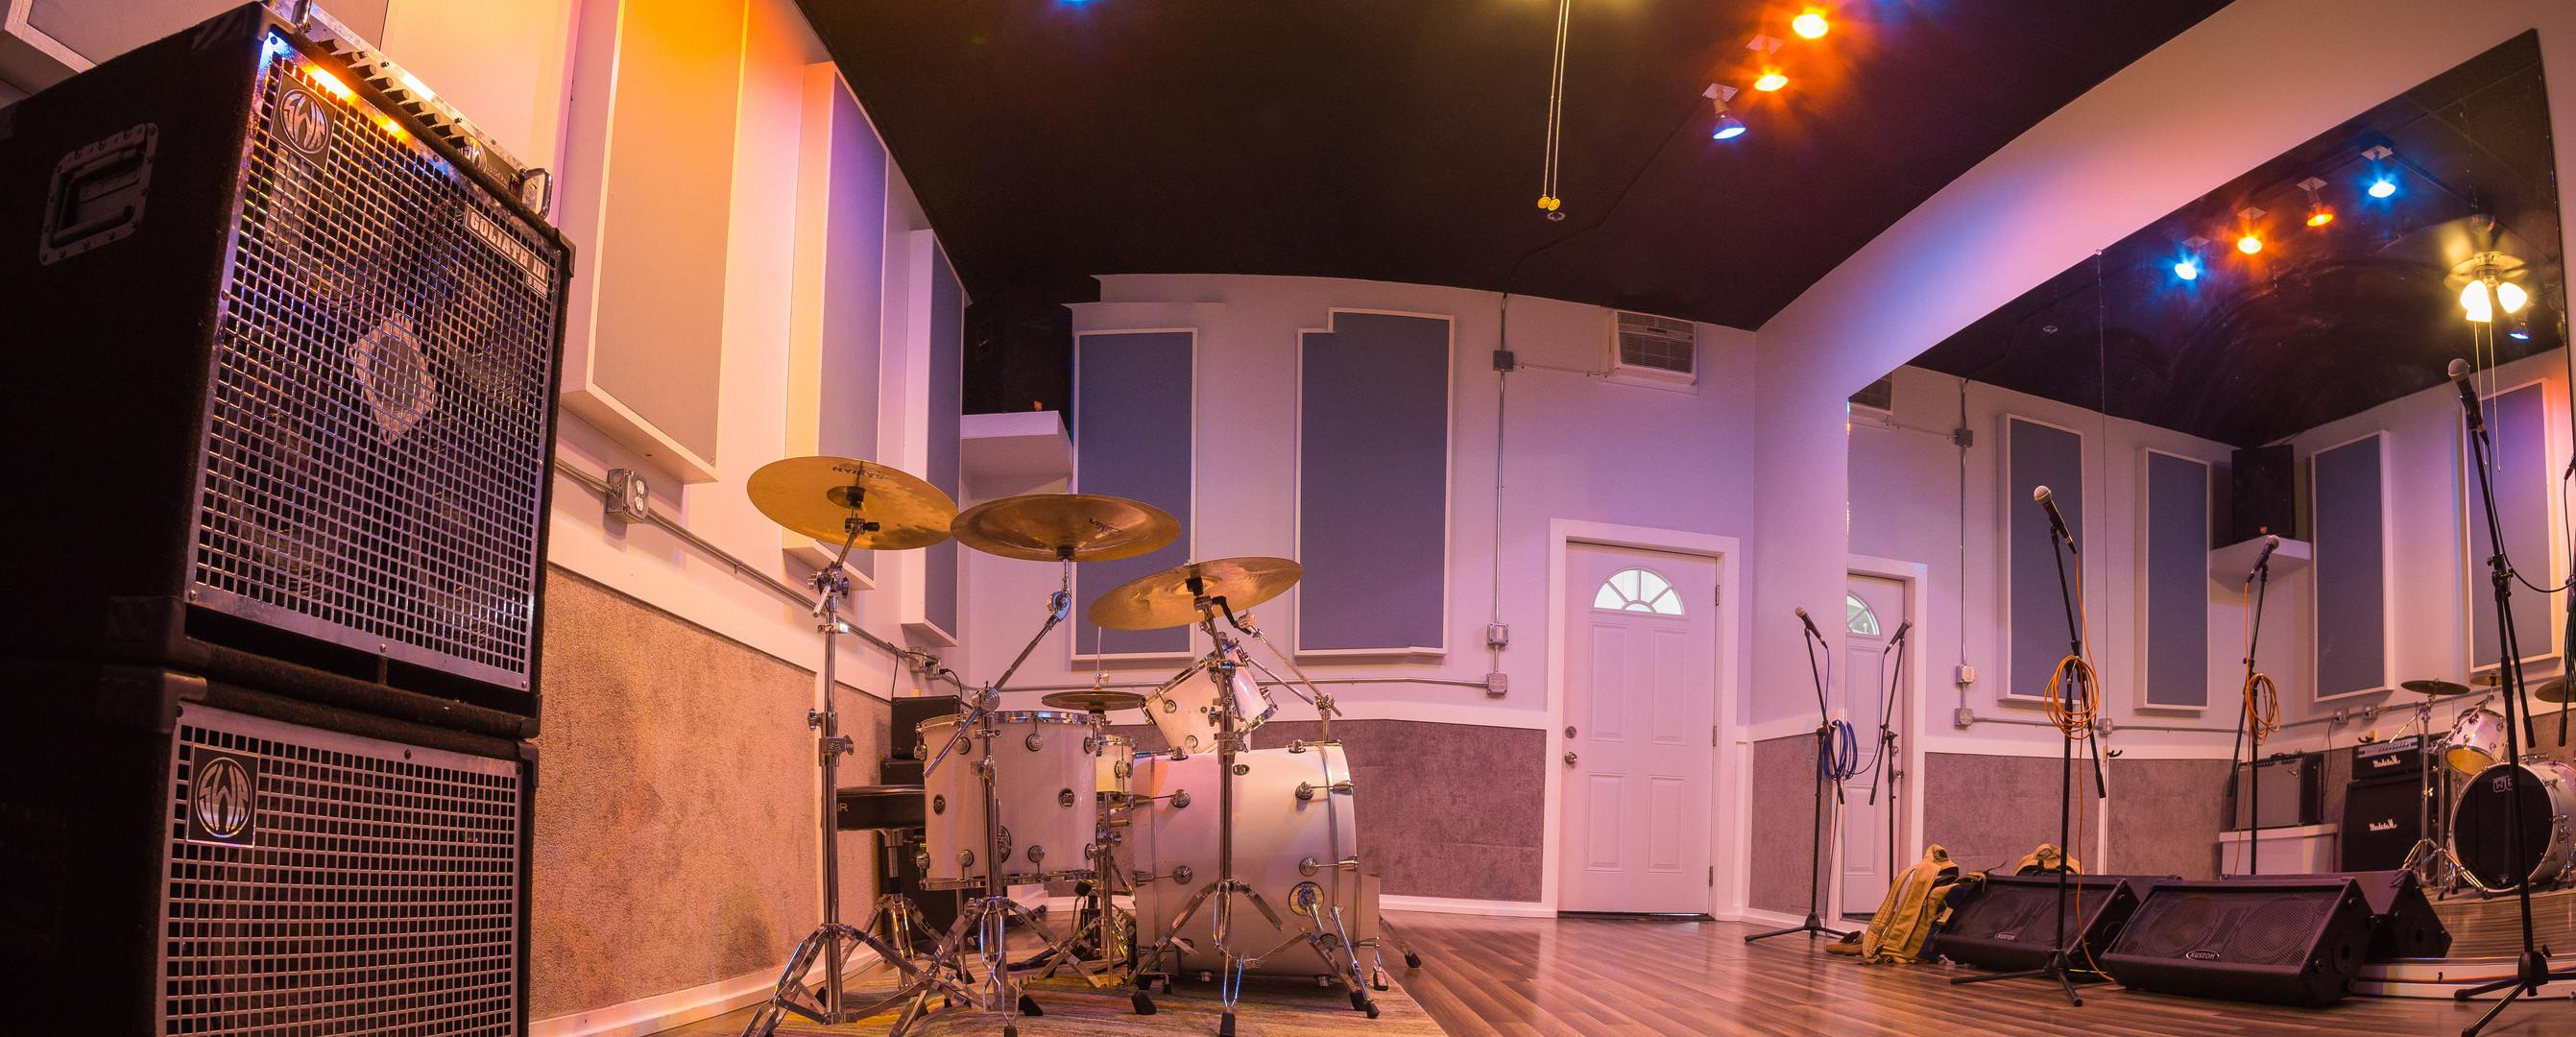 Full wall of mirrors in Studio B